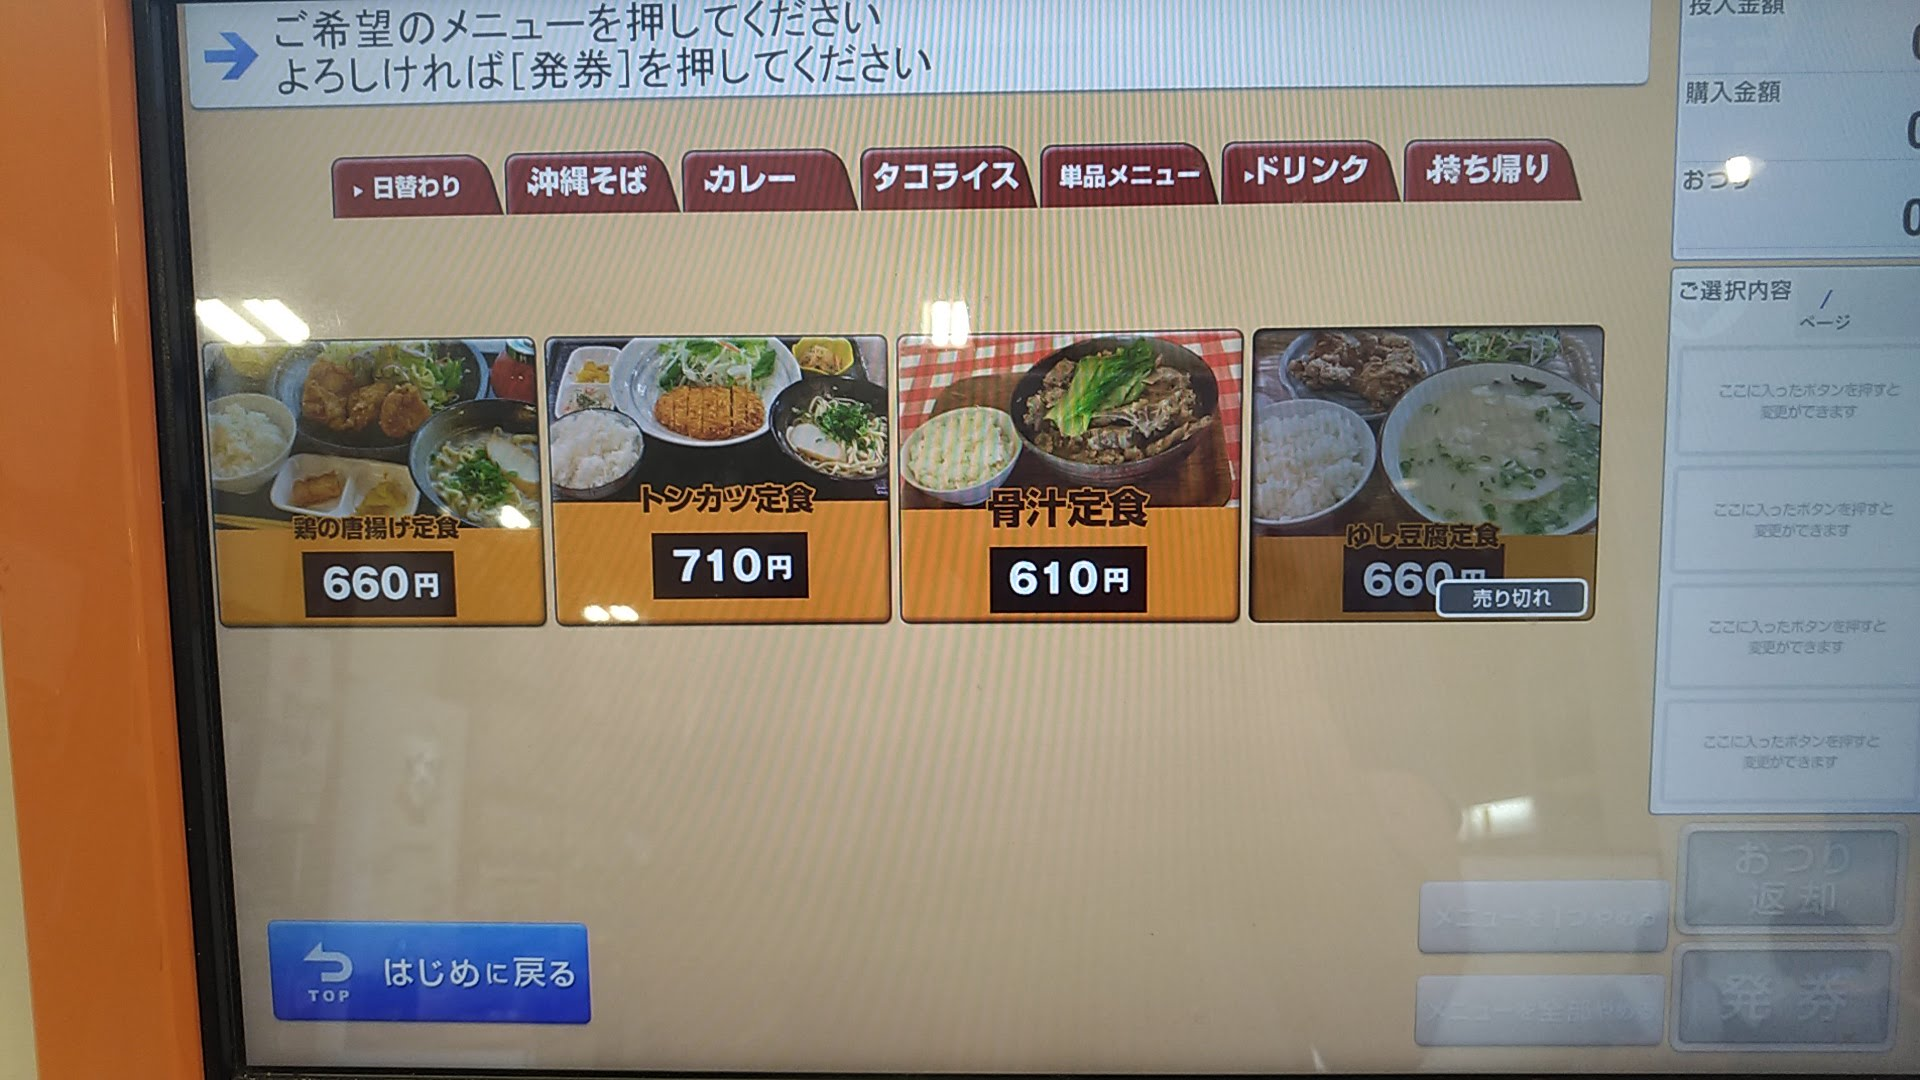 YONAR'S meal ticket machine 2